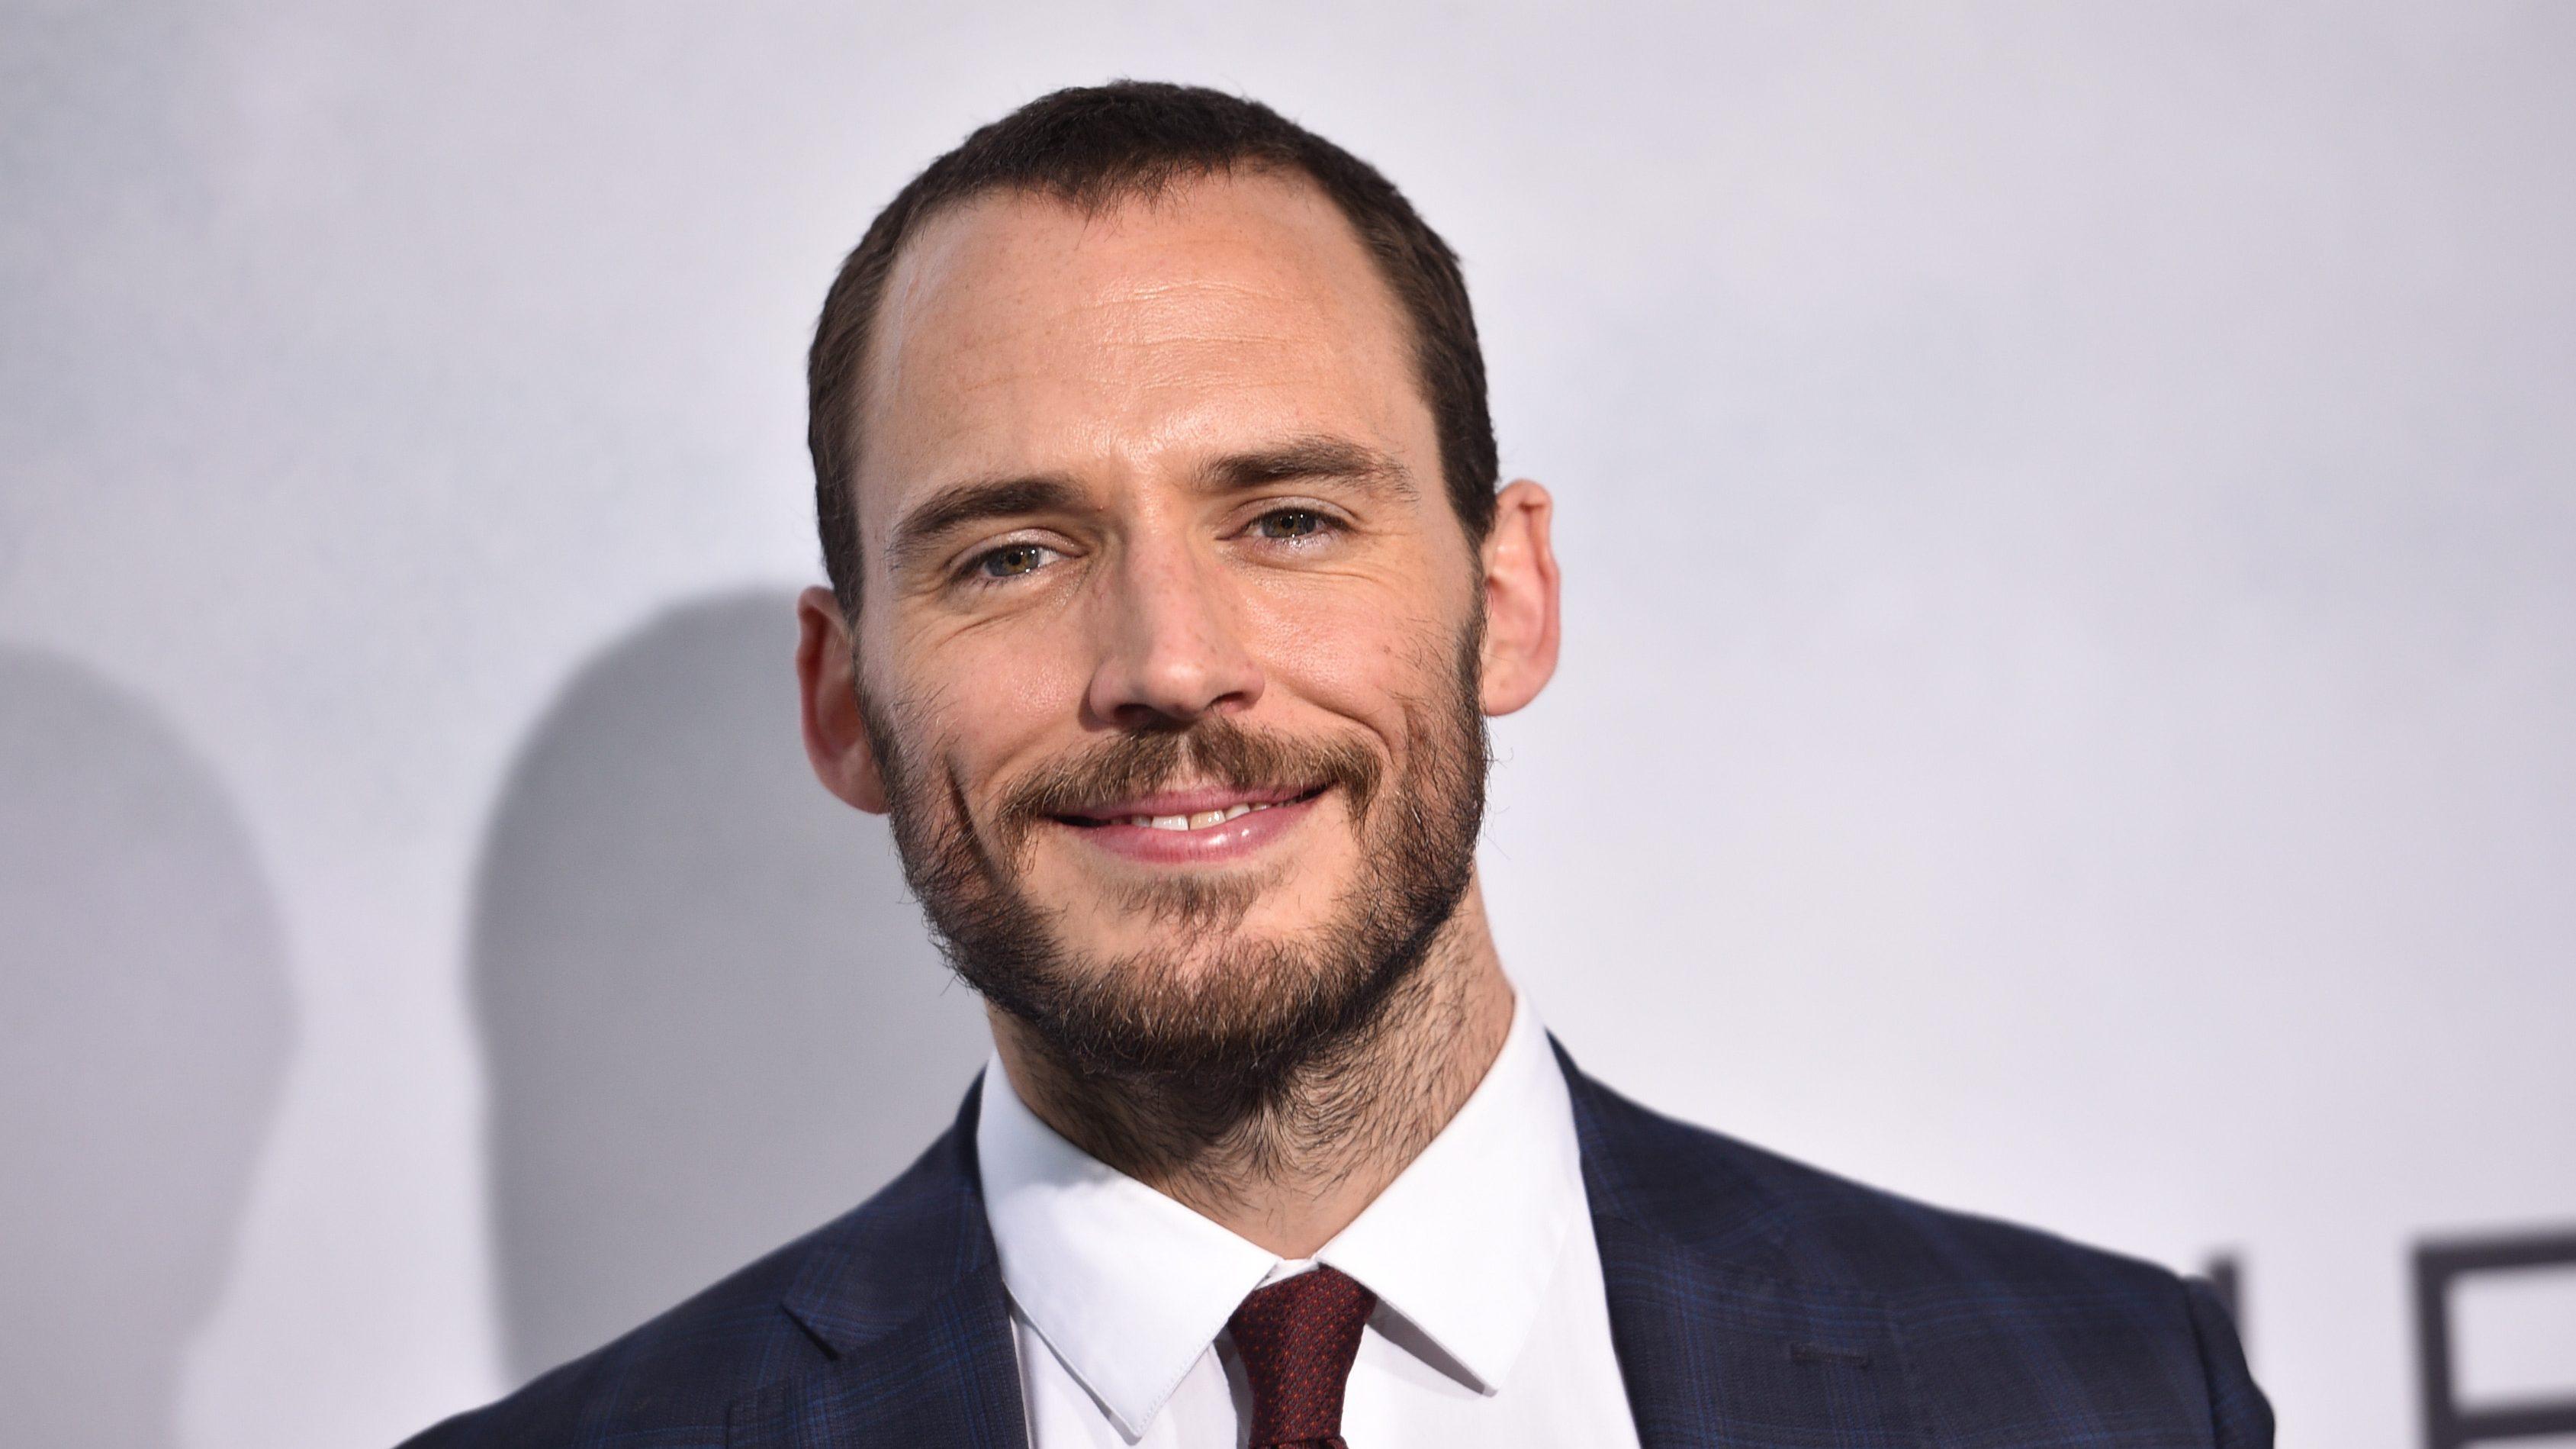 Sam Claflin Boards Enola Holmes Film At Legendary Deadline